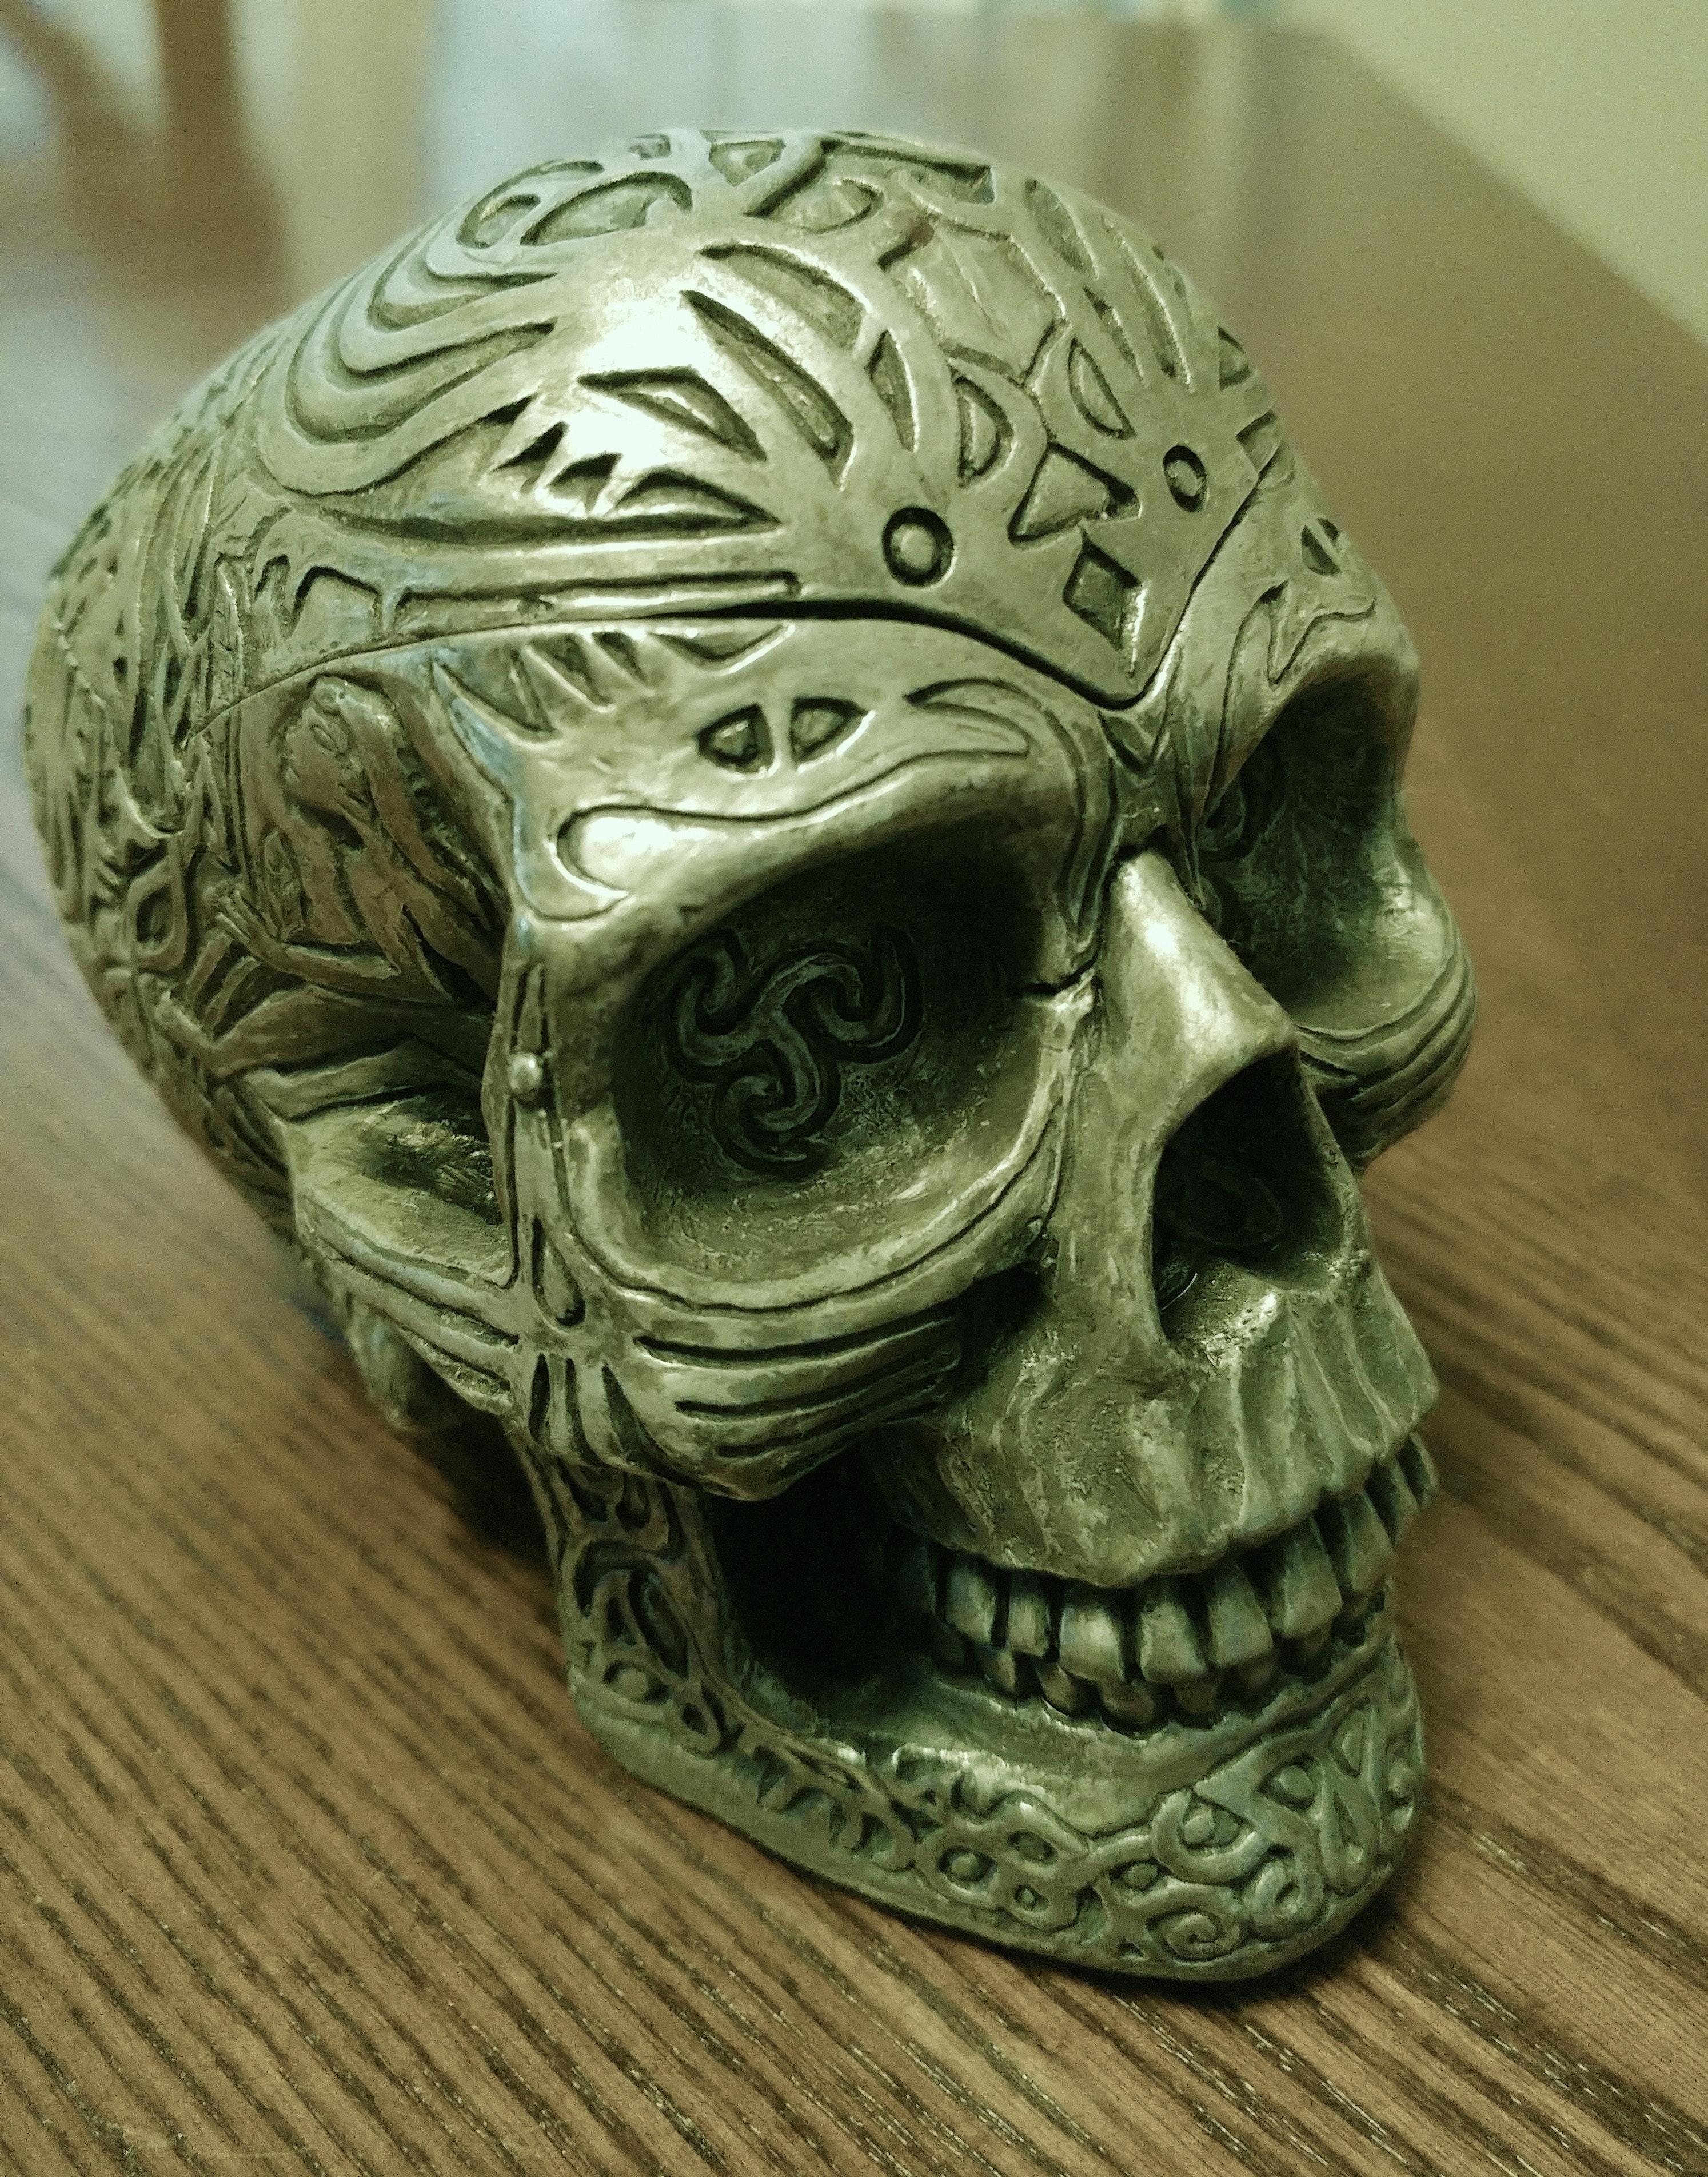 Gray ceramic skull figurine photo